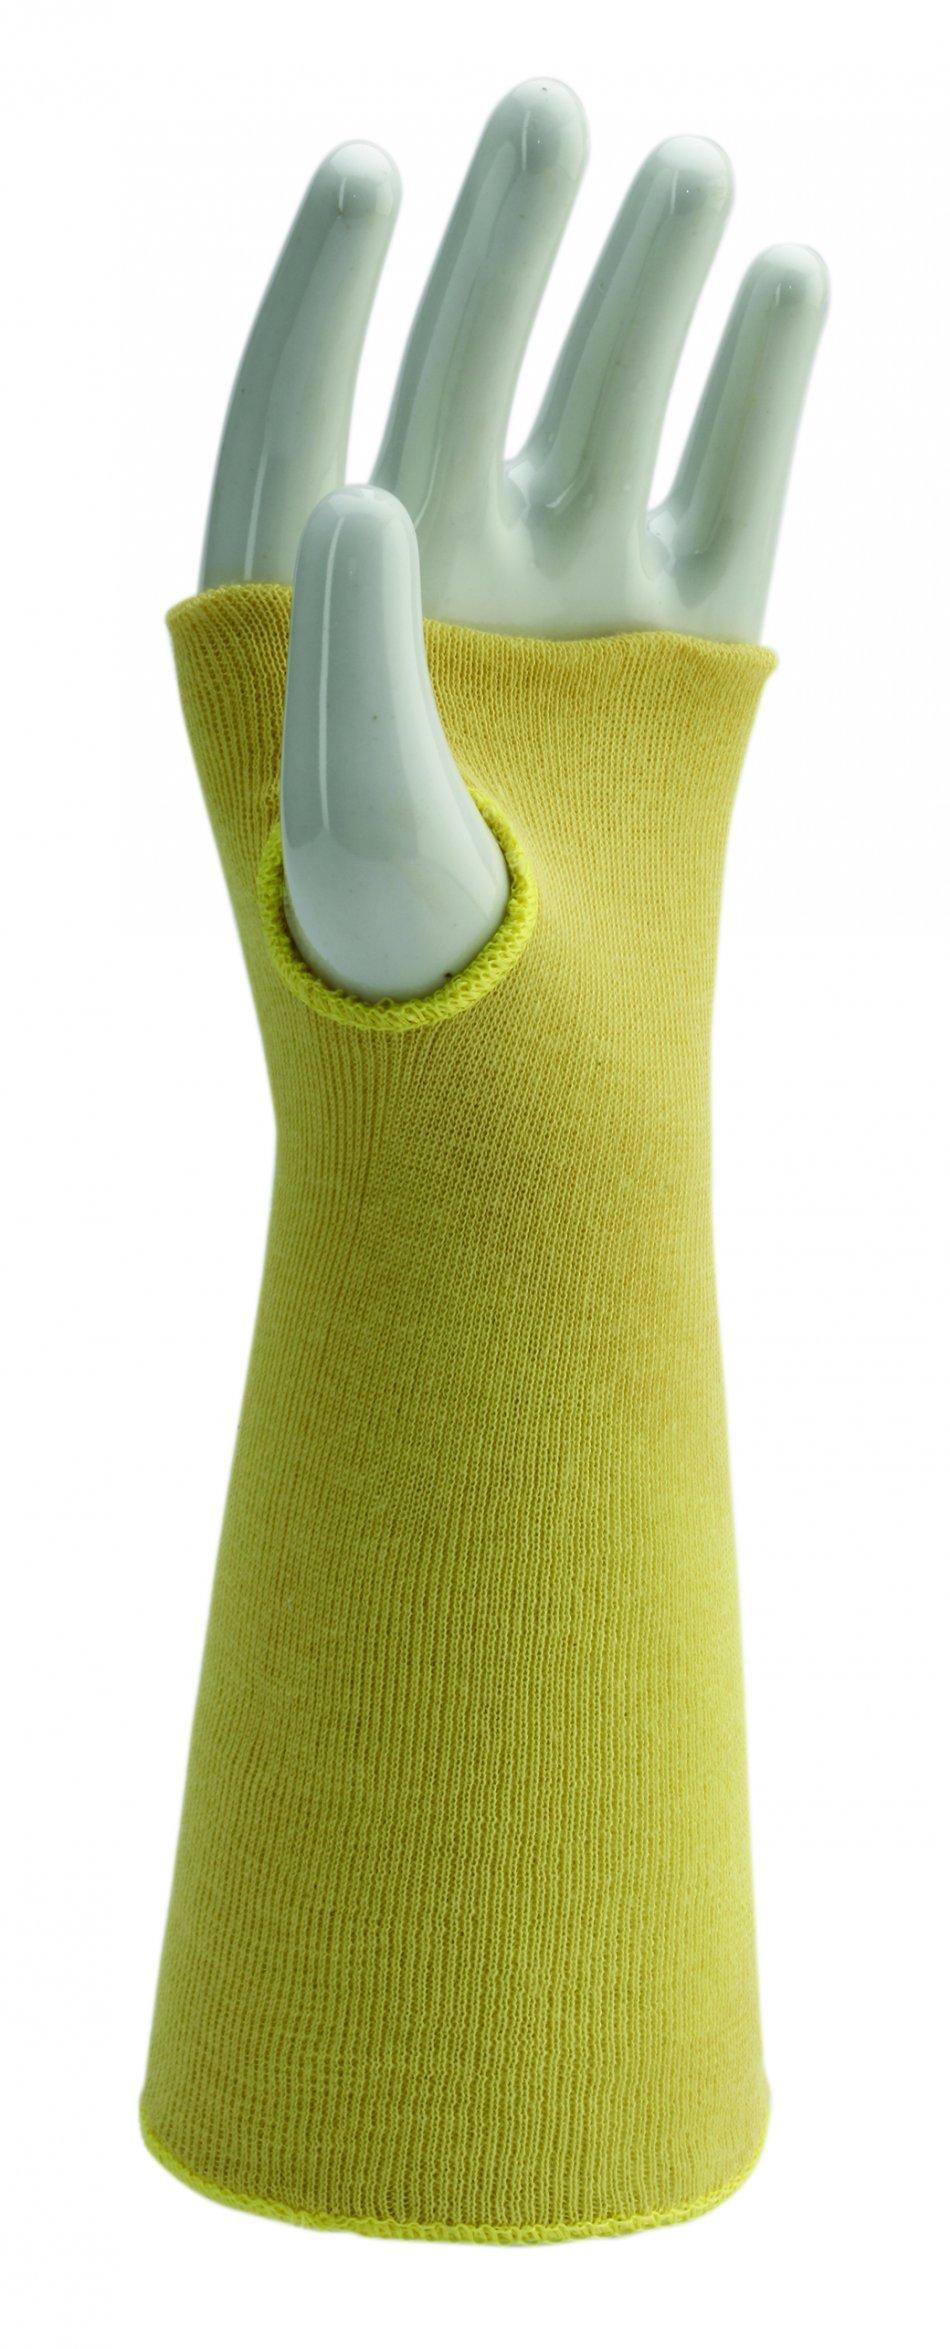 Protector kevlar pentru antebraţ,25 cm